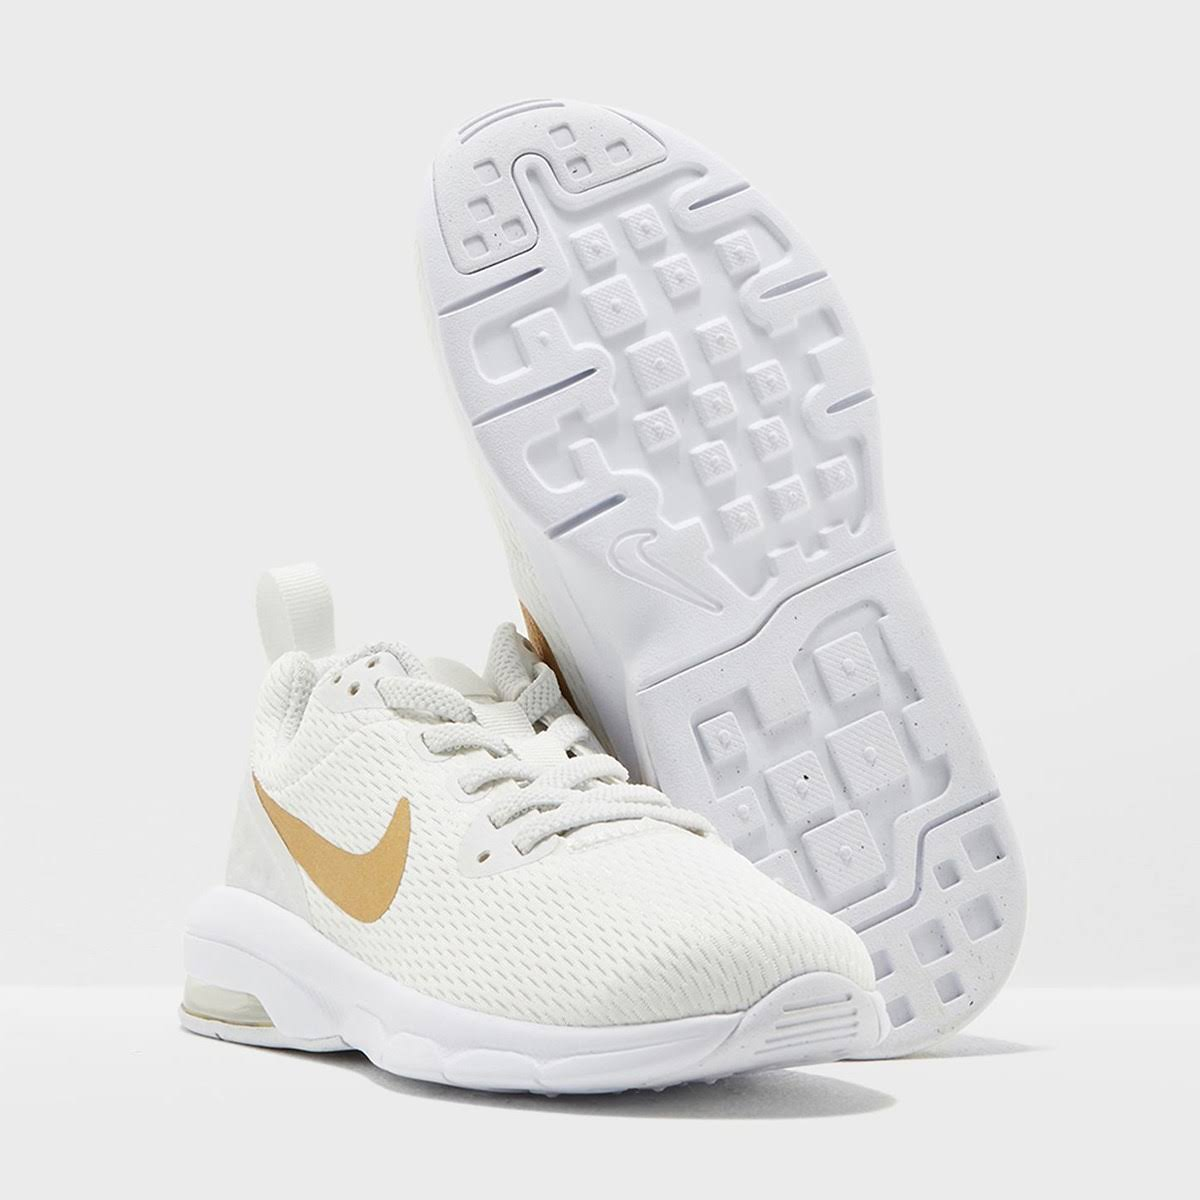 Motion psv Max Beyaz Air 917653 100 Çocuk Lw Nike Ayakkabı fOwIFI